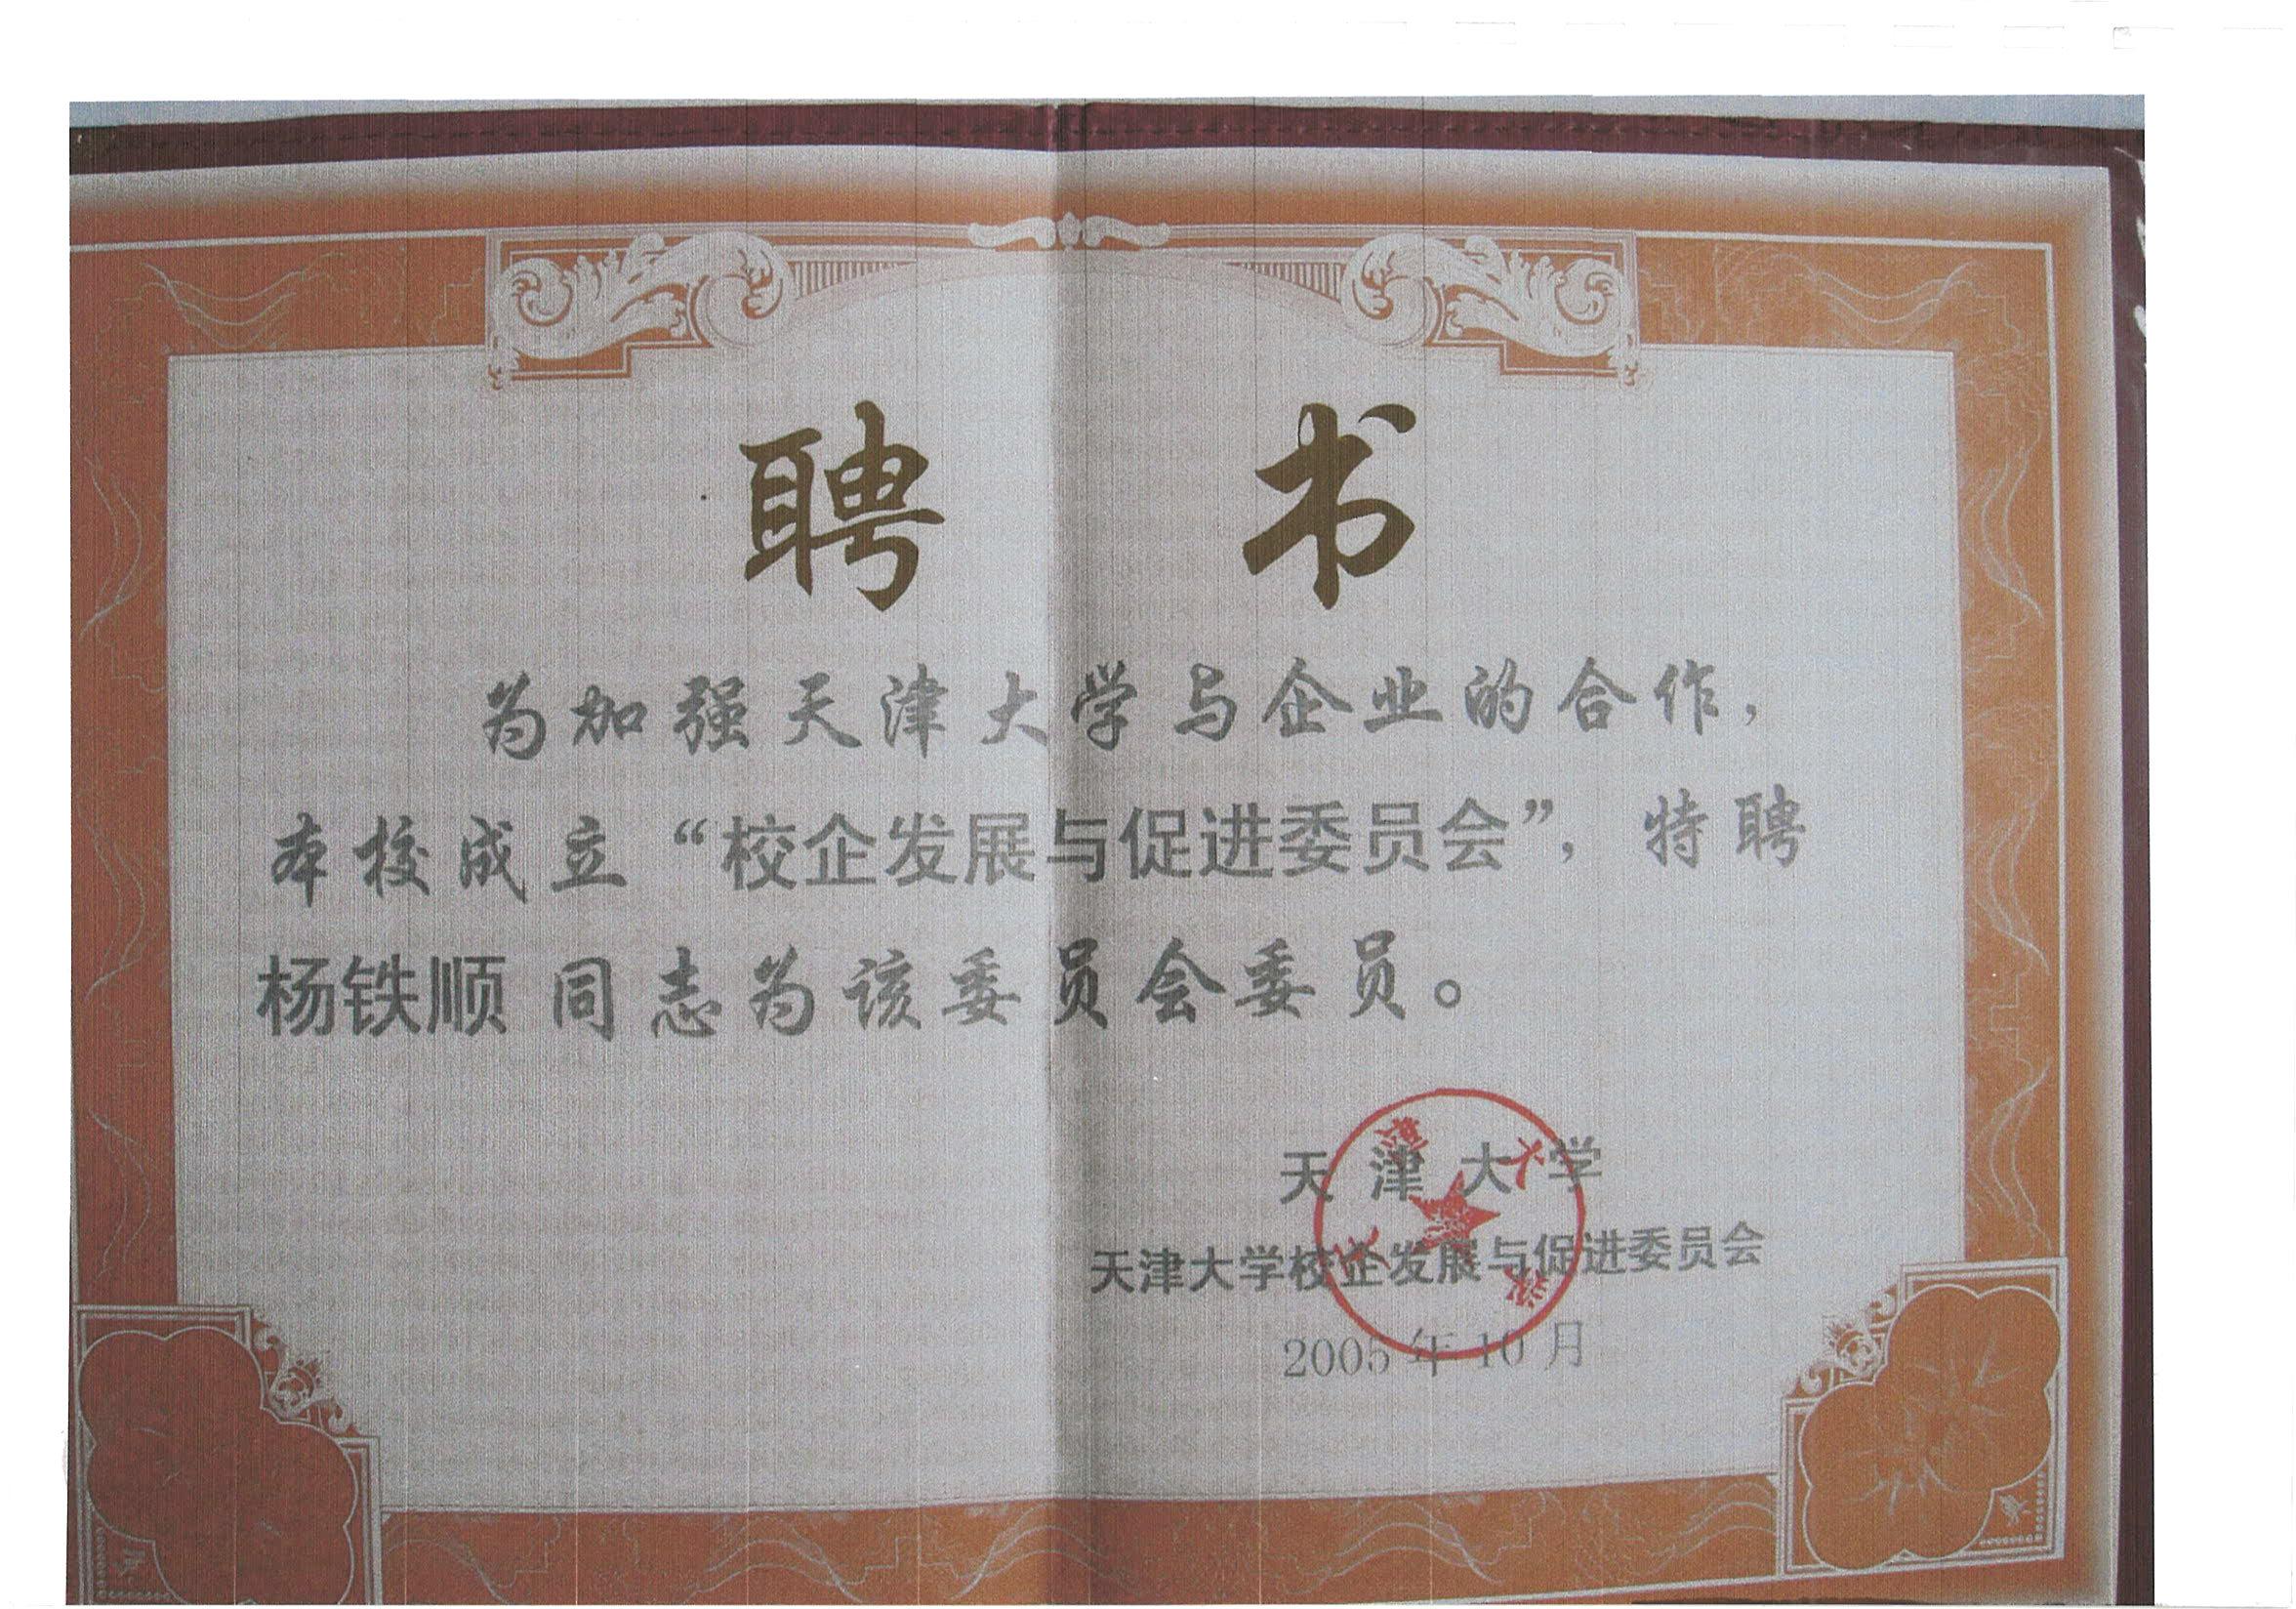 "<div style=""text-align:center;""> 天津大学""校企发展与促进委员会""<br /> 委员 </div>"